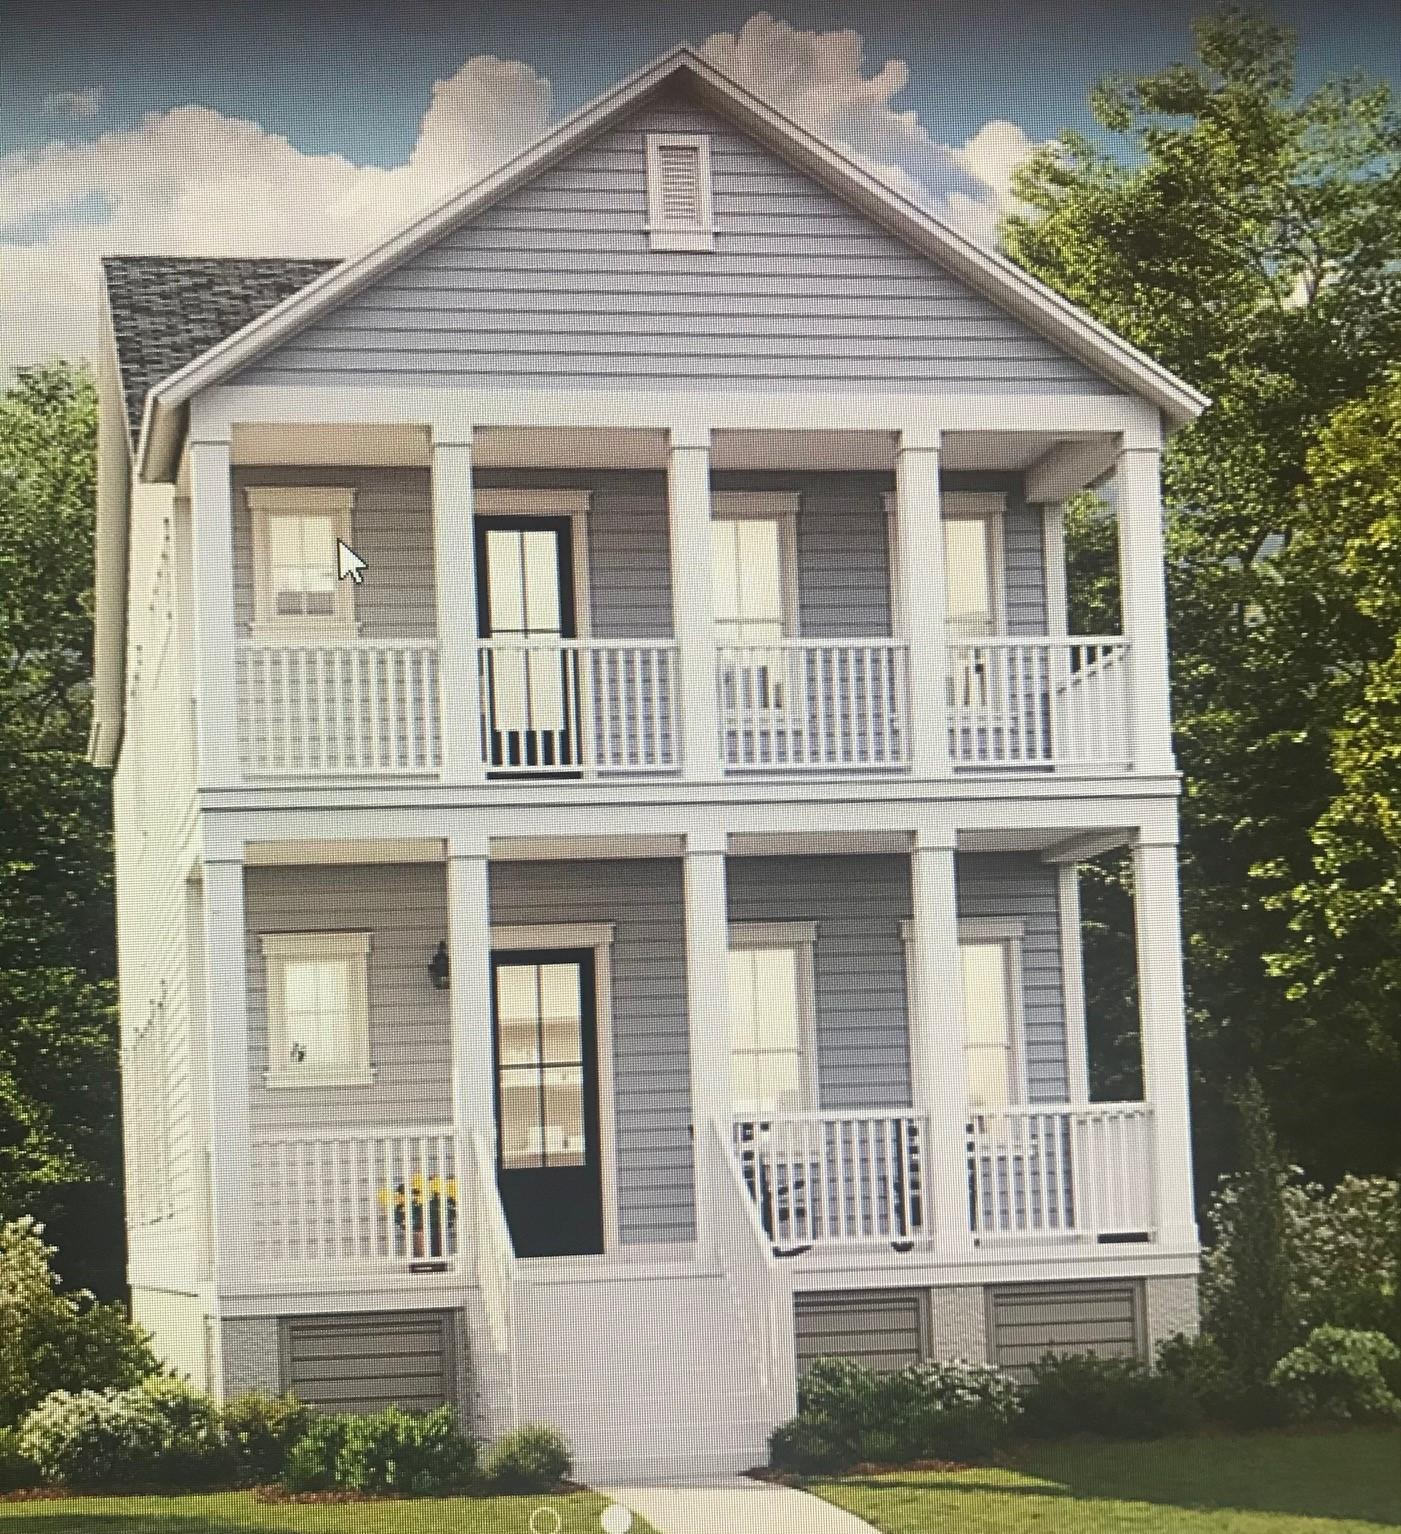 Carolina Park Homes For Sale - 1768 Agate Bay, Mount Pleasant, SC - 0